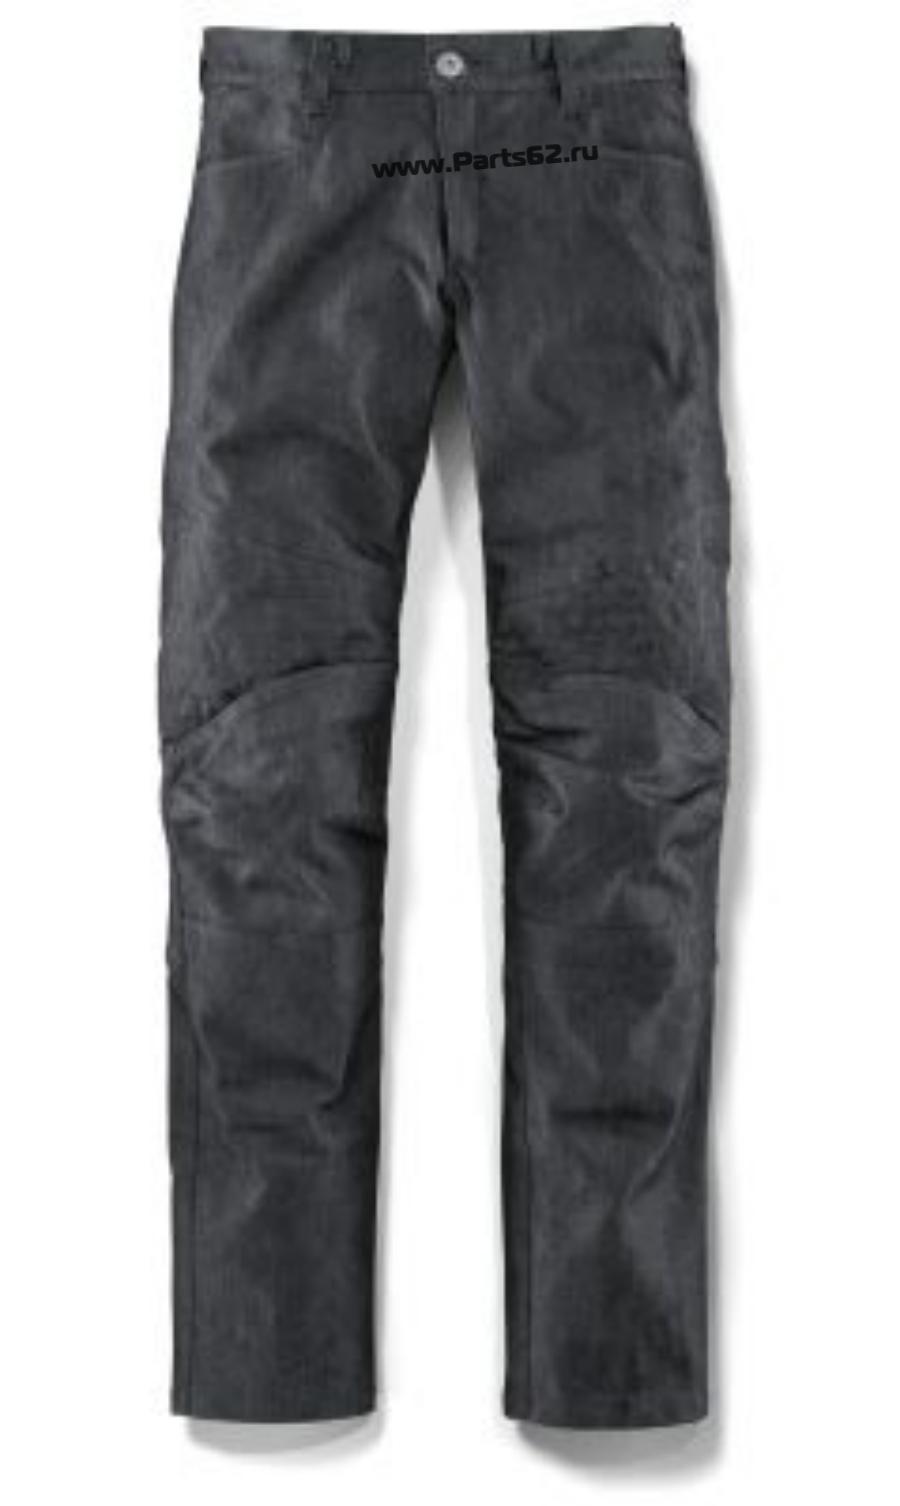 Женские мото-джинсы BMW Motorrad Trousers Ride Ladies Grey